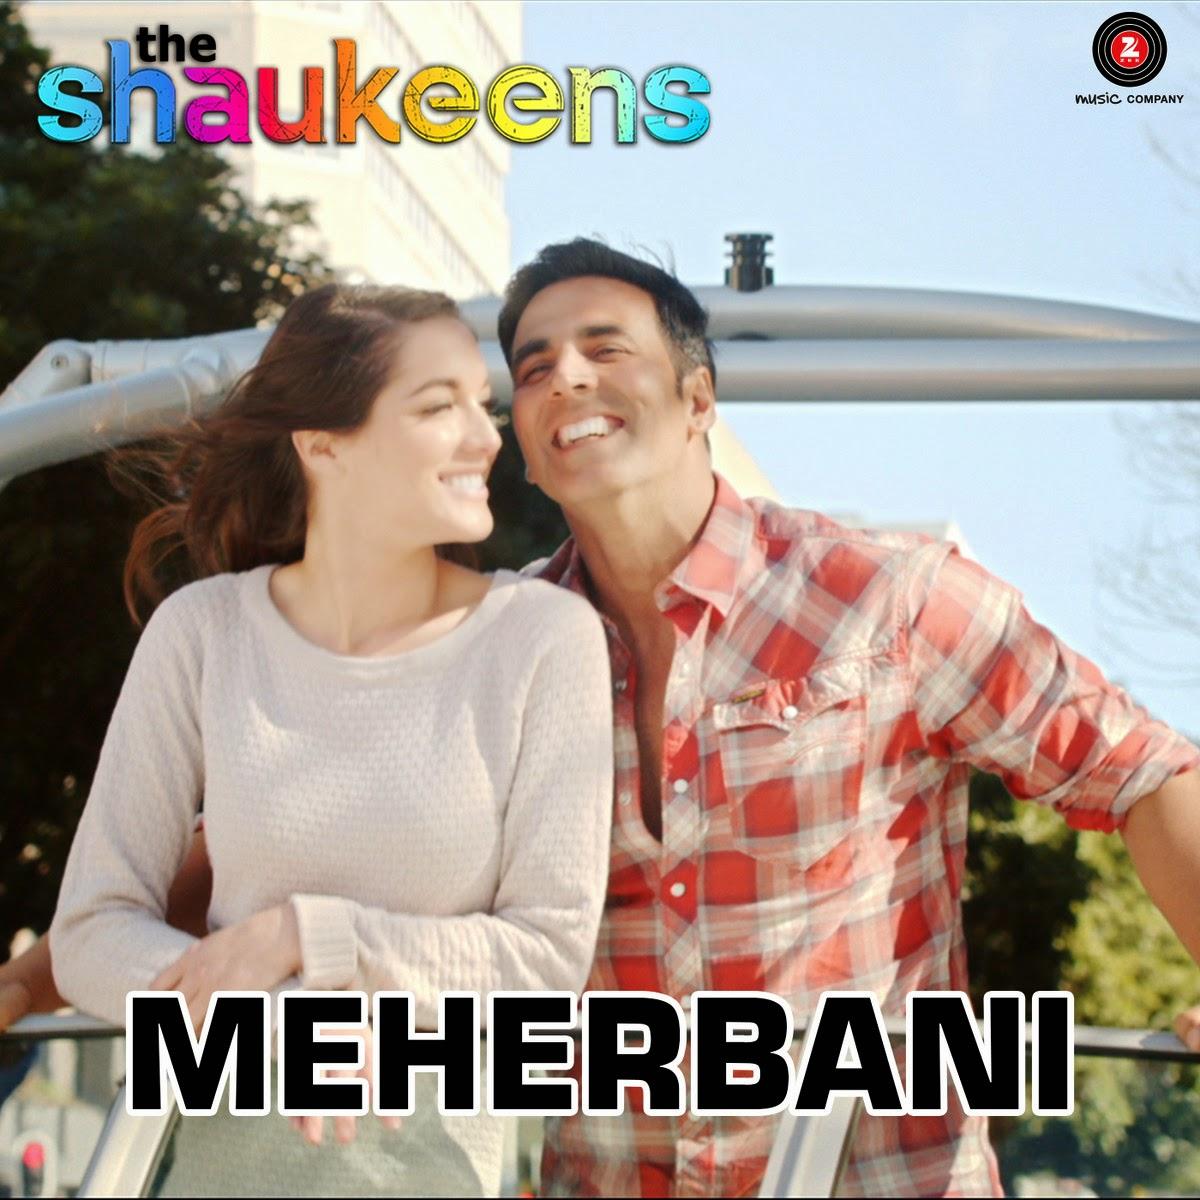 Sakhiyaan Mp3 Song Download Neha Malik: The Shaukeens [2014-MP3-VBR-320Kbps]